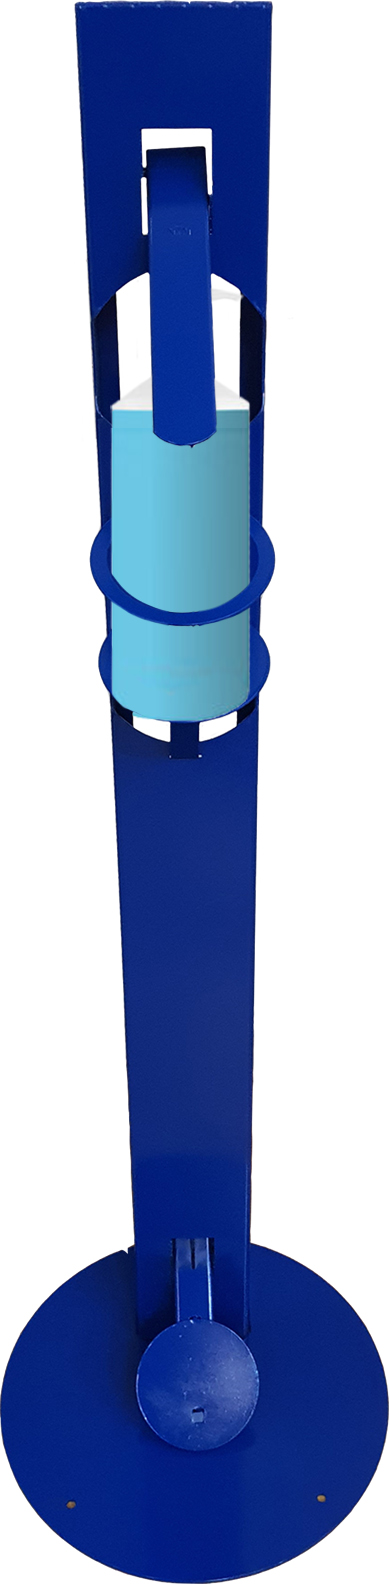 Free Standing / Floor Mounted Sanitizer Dispenser Stainless Steel